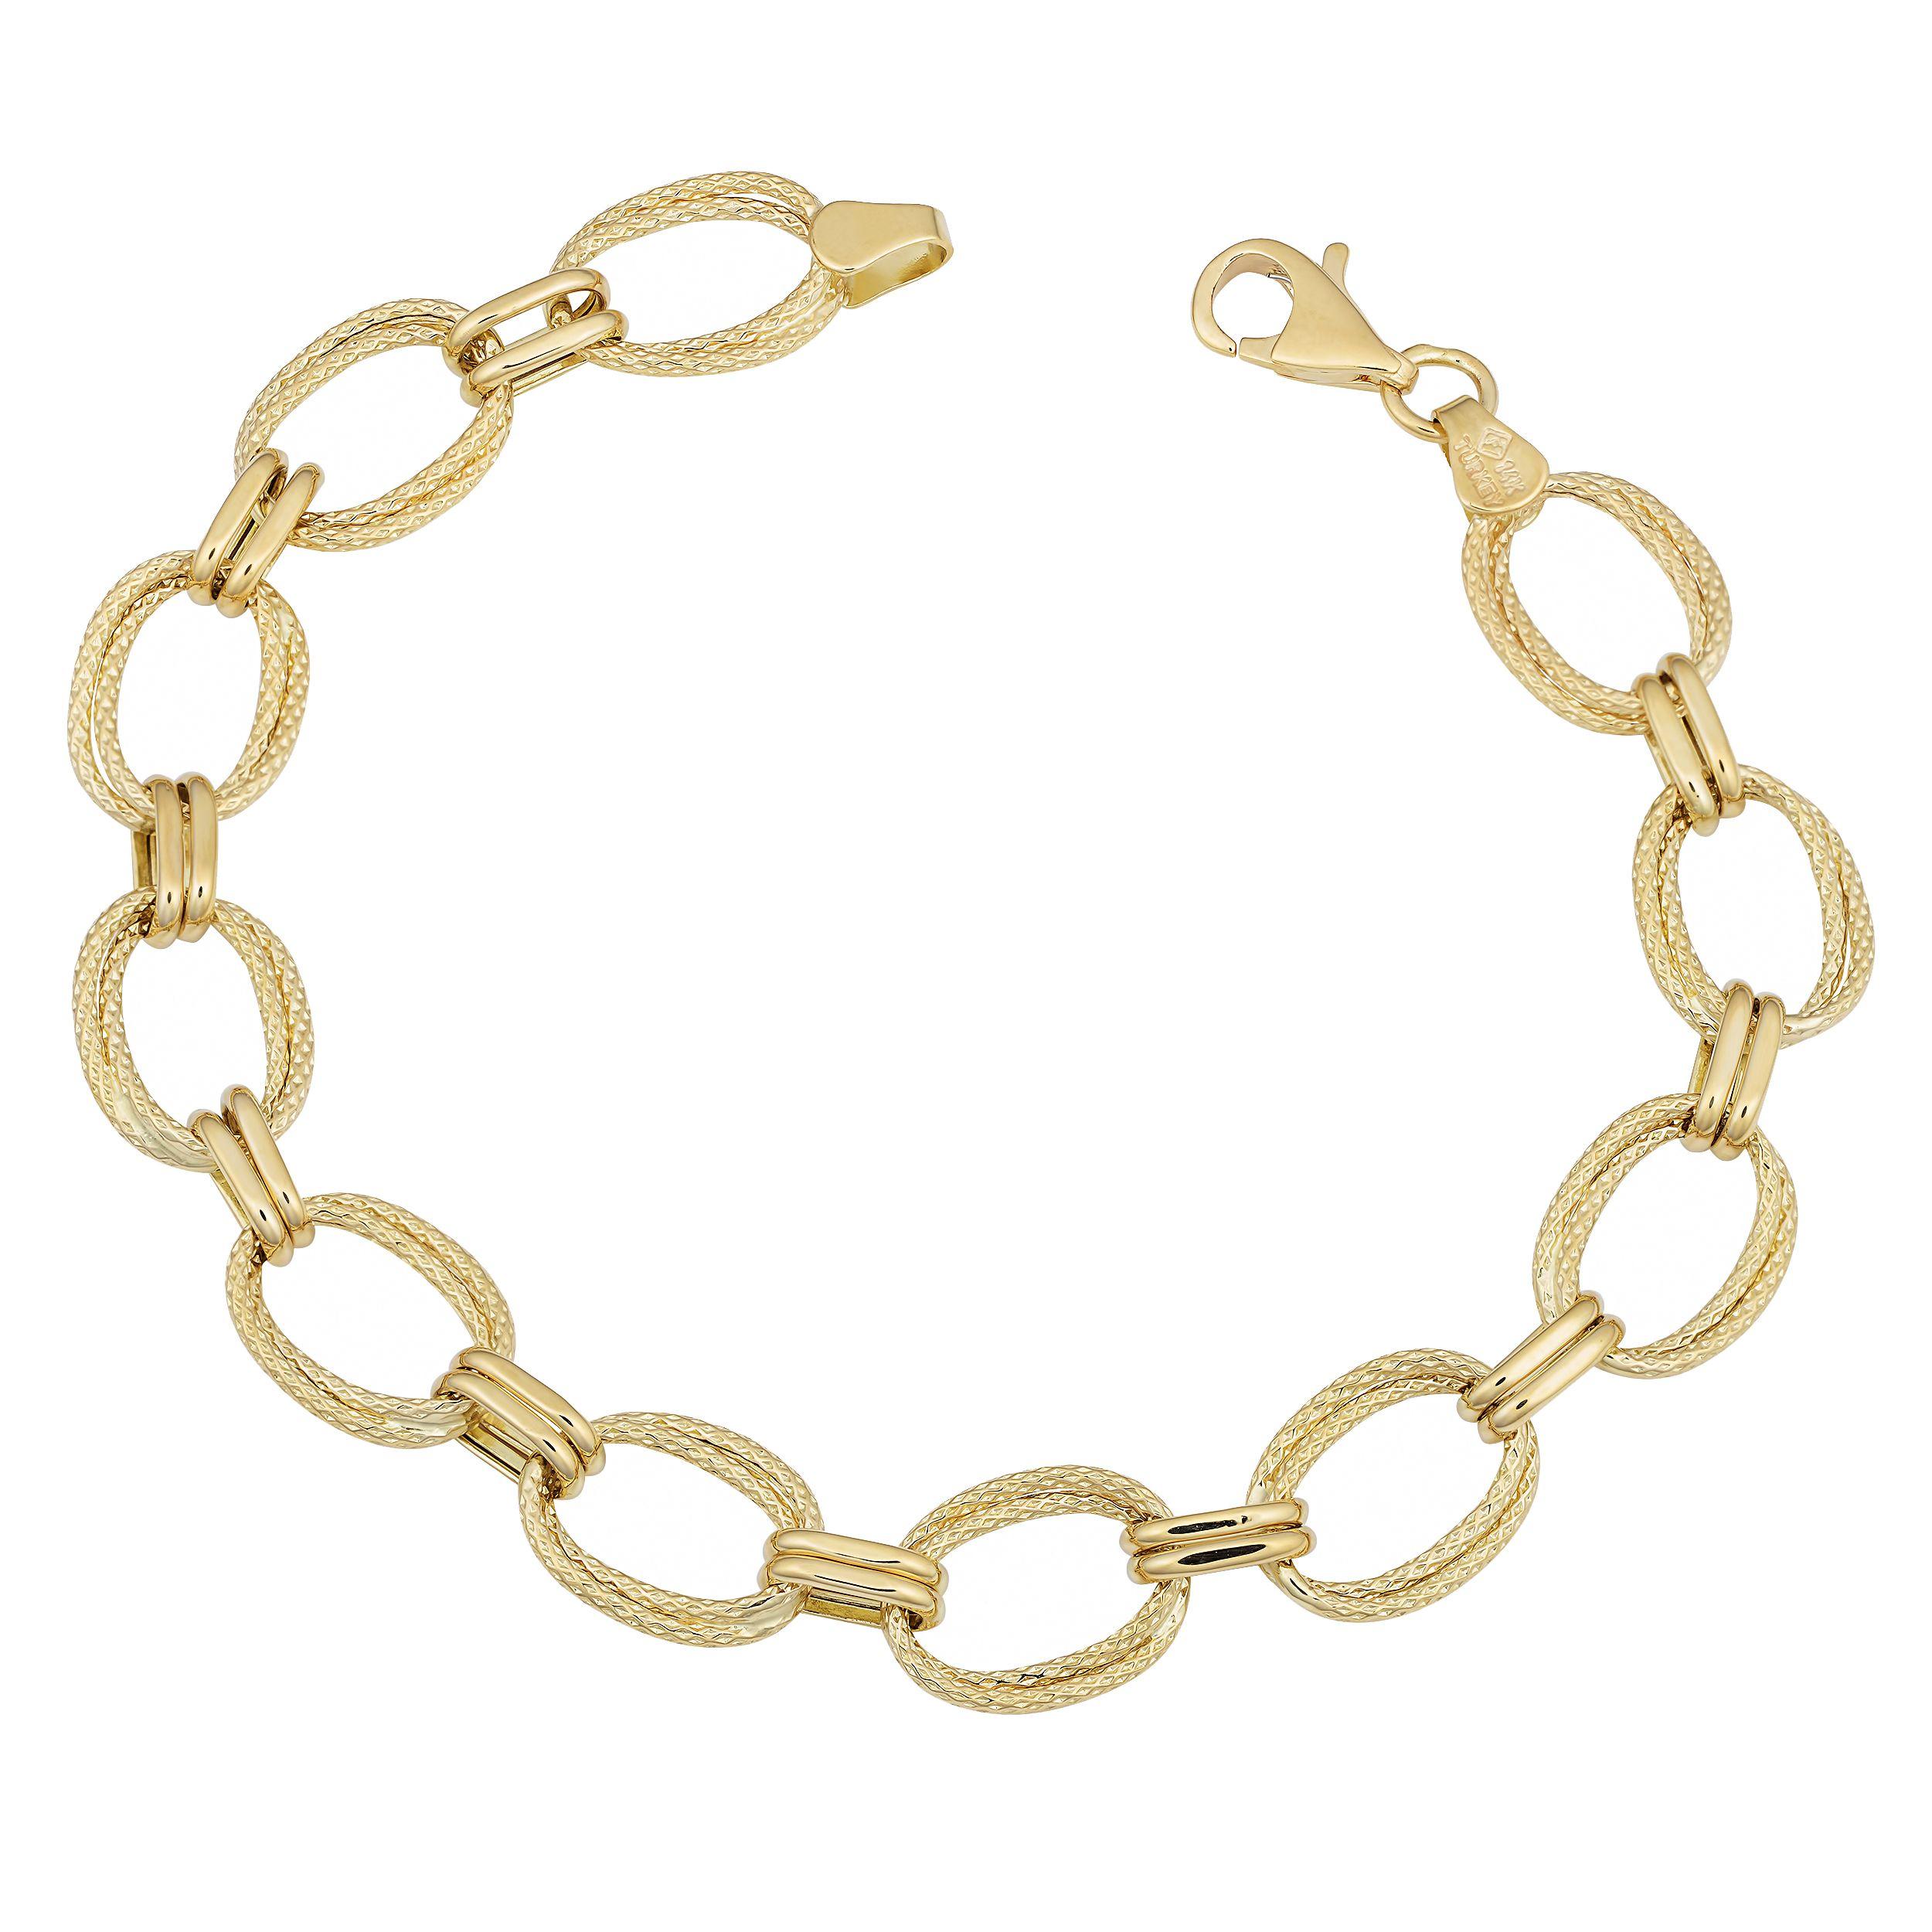 Boasting a simple yet elegant design this bracelet showcases a high